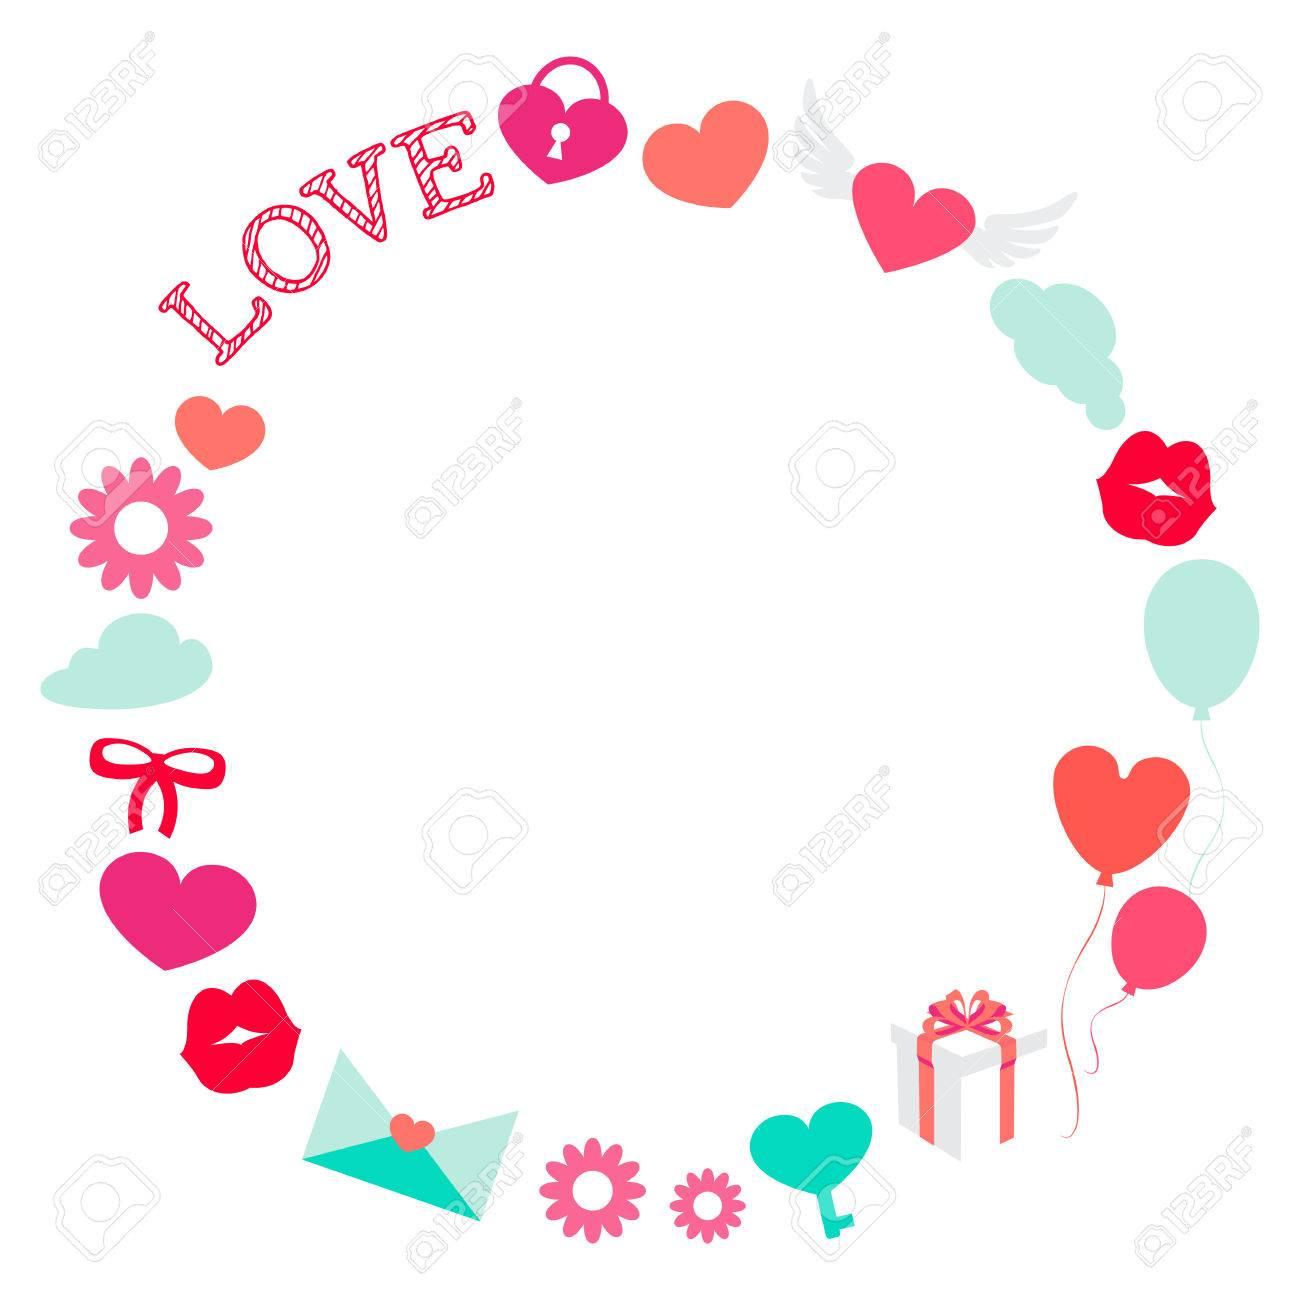 Día De San Valentín Amor Romántico Marco Redondo Ilustración Plana ...